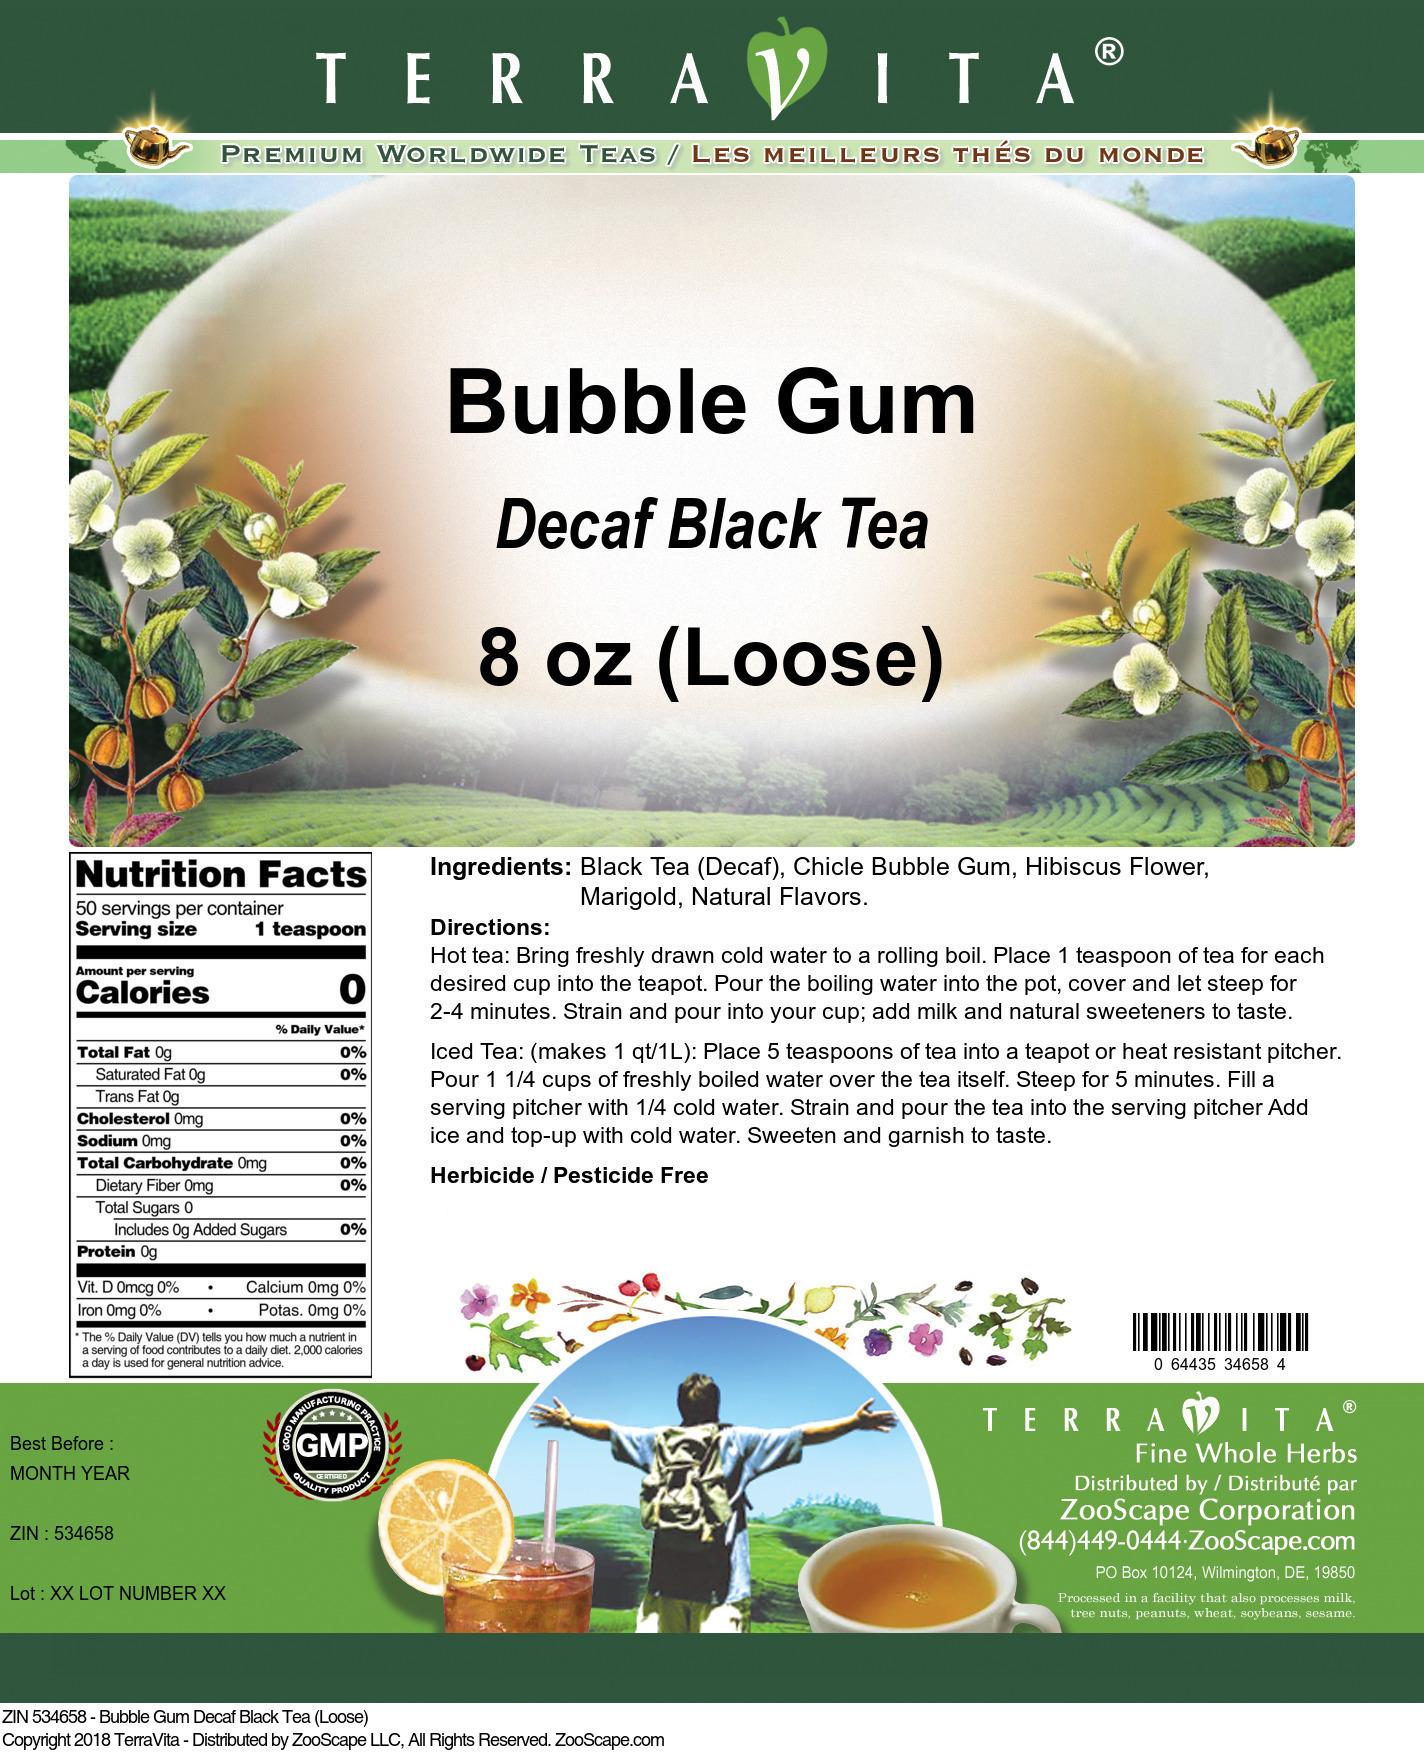 Bubble Gum Decaf Black Tea (Loose)